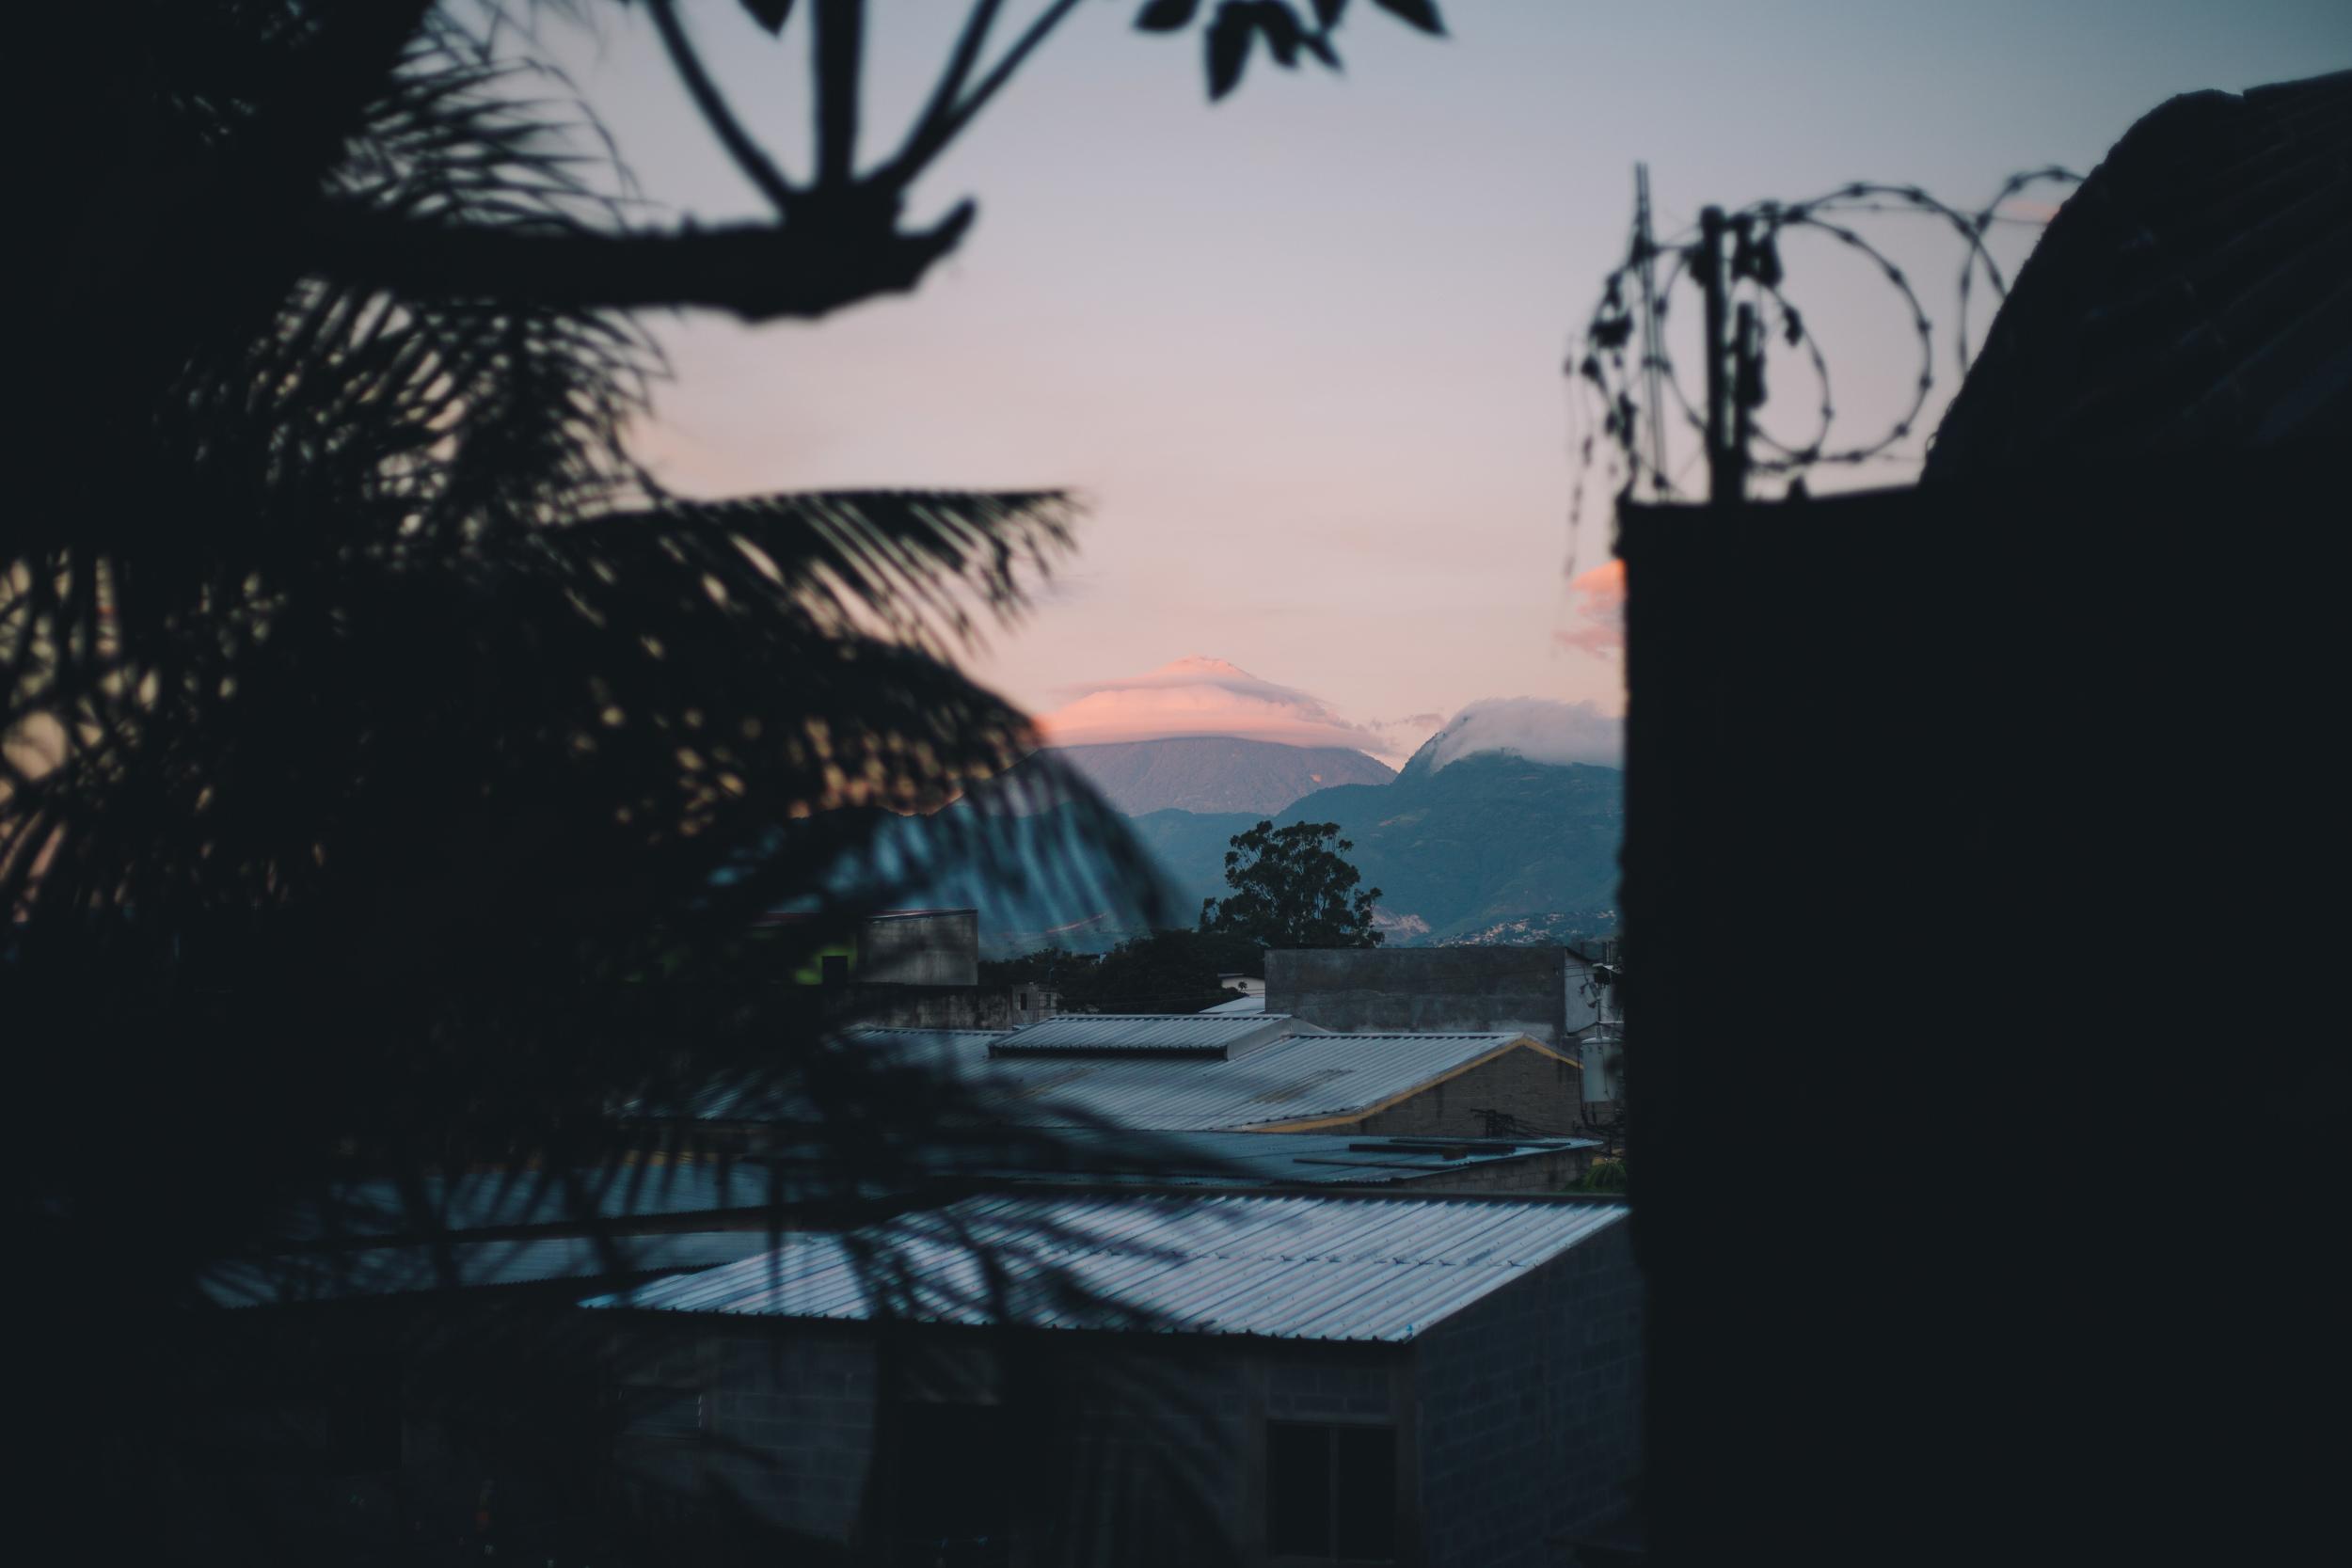 Guatemala2015-11.jpg